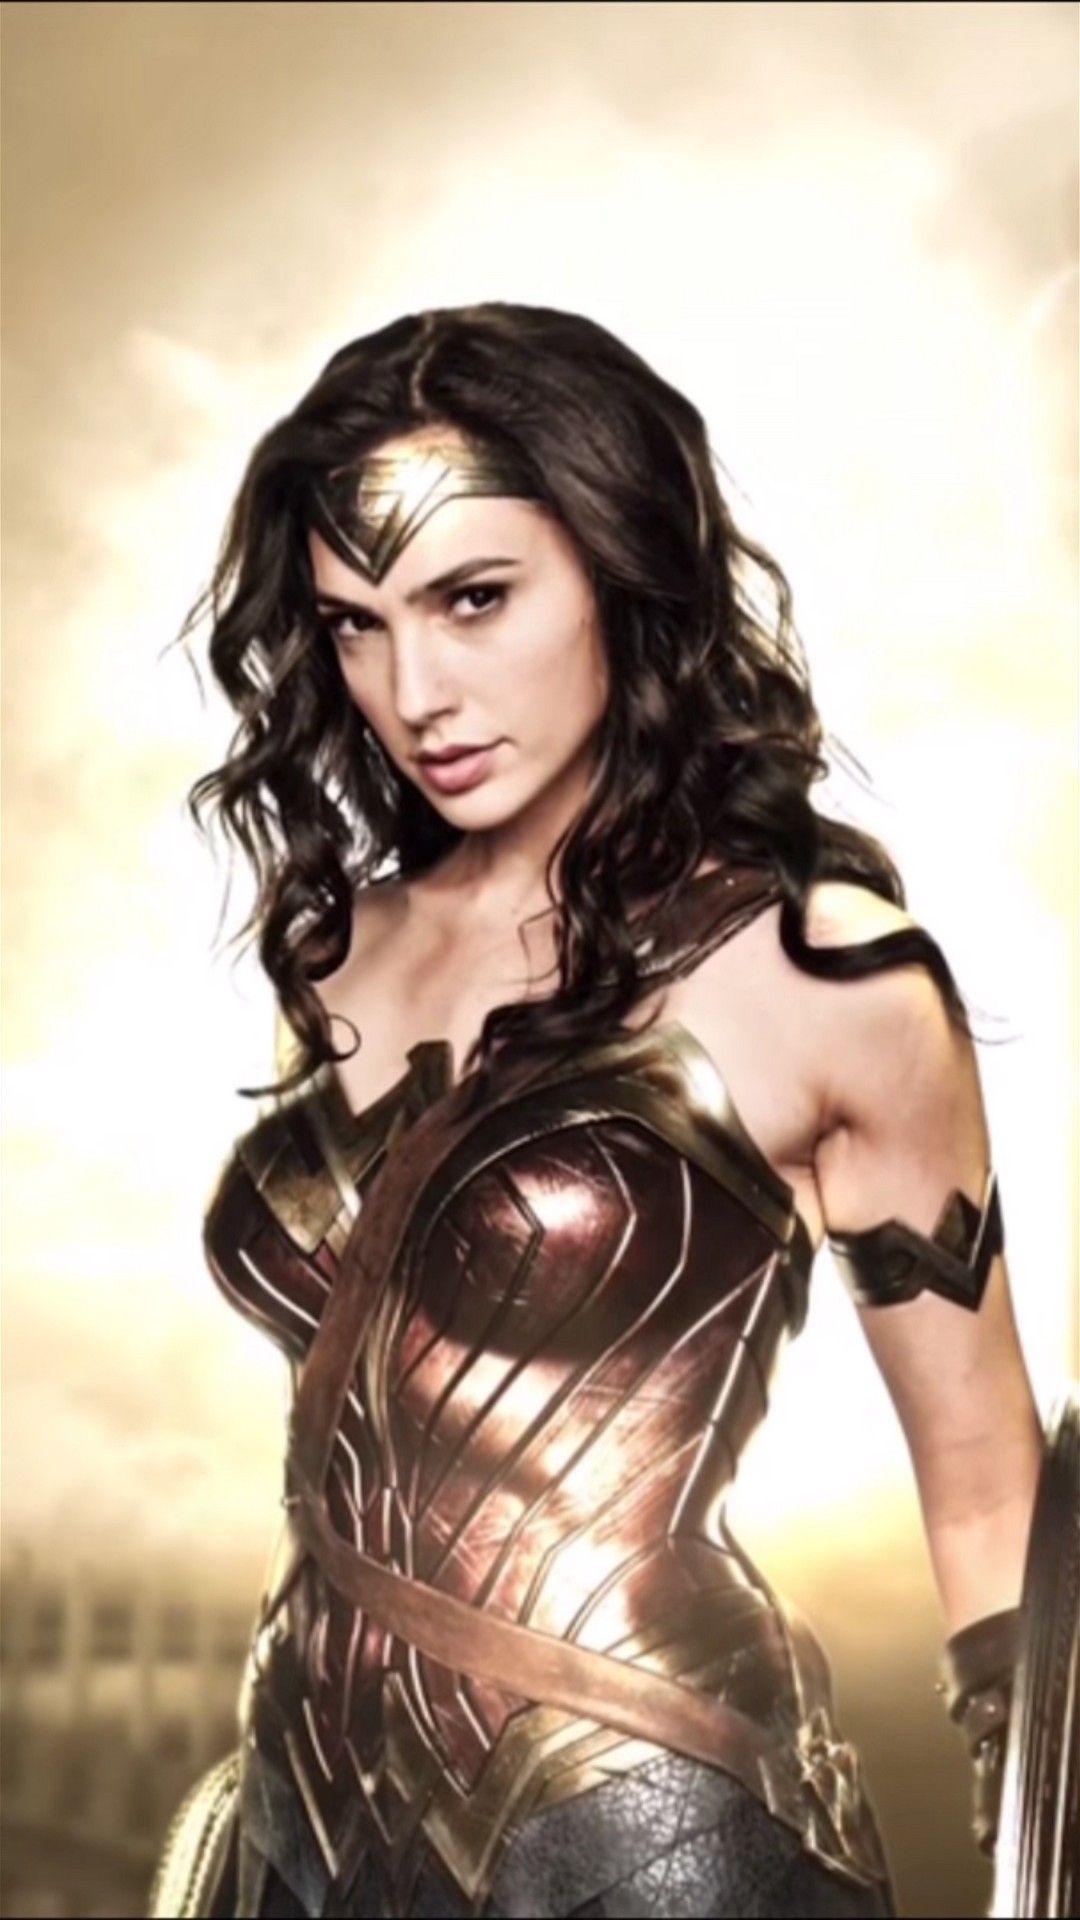 Wonder Woman Gal Gadot Wallpaper Phone Best Iphone Wallpaper Wonder Woman Pictures Wonder Woman Movie Gal Gadot Wonder Woman